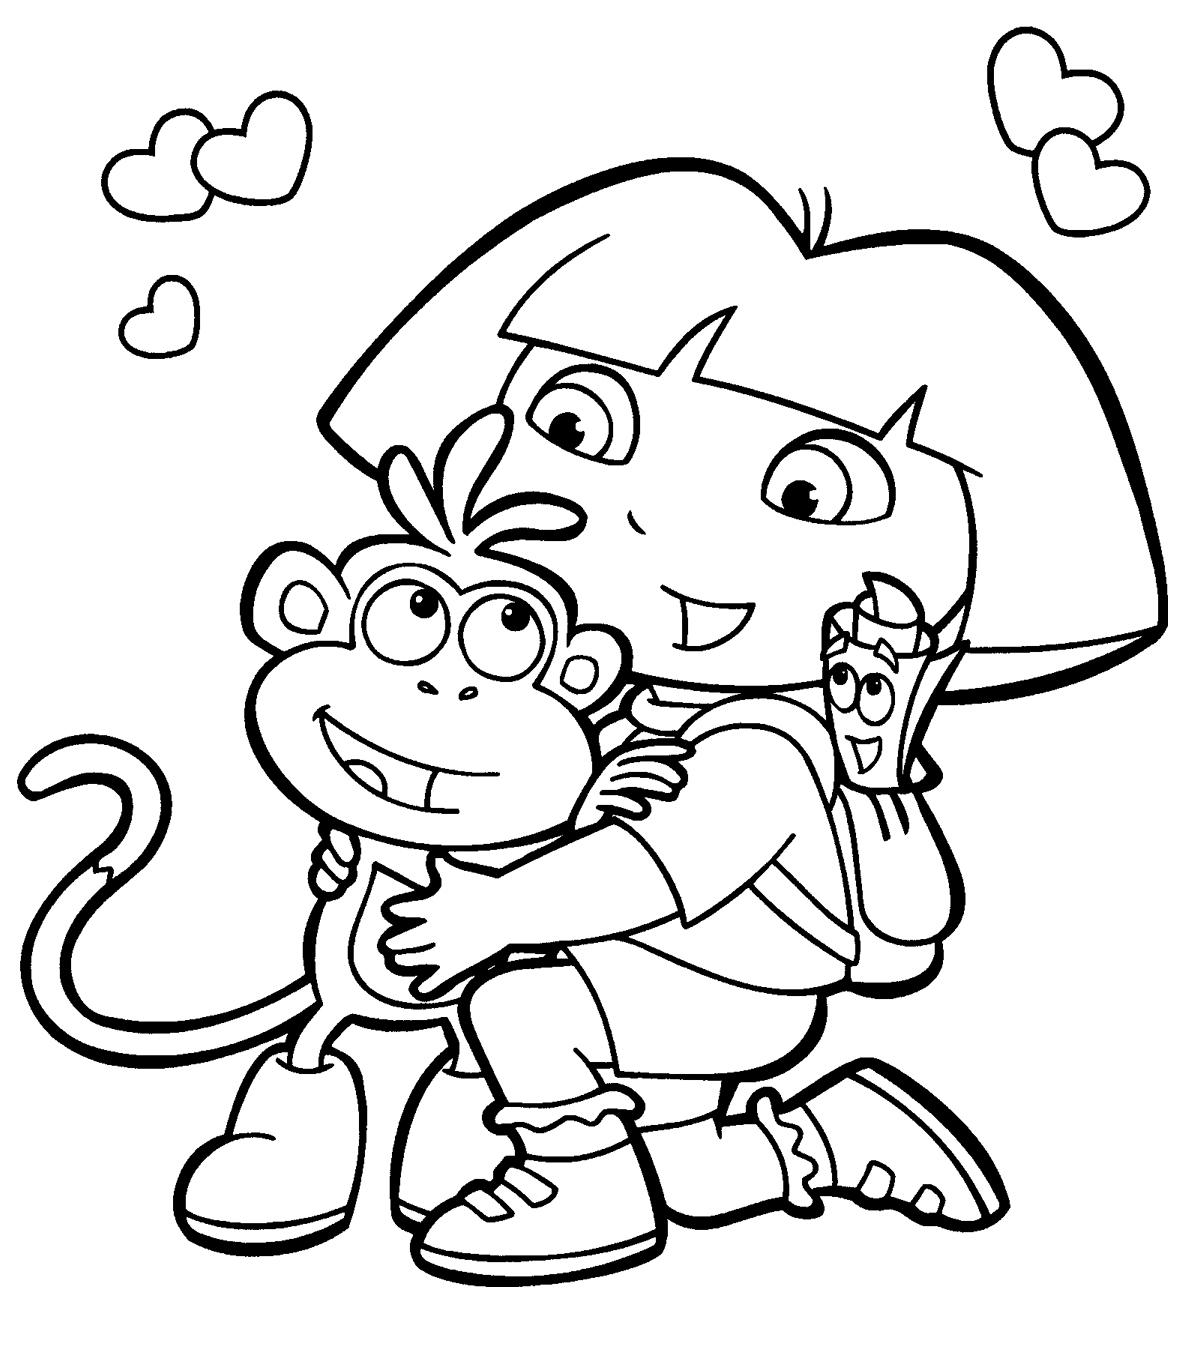 Dora The Explorer Coloring Pages 15 Coloring Kids